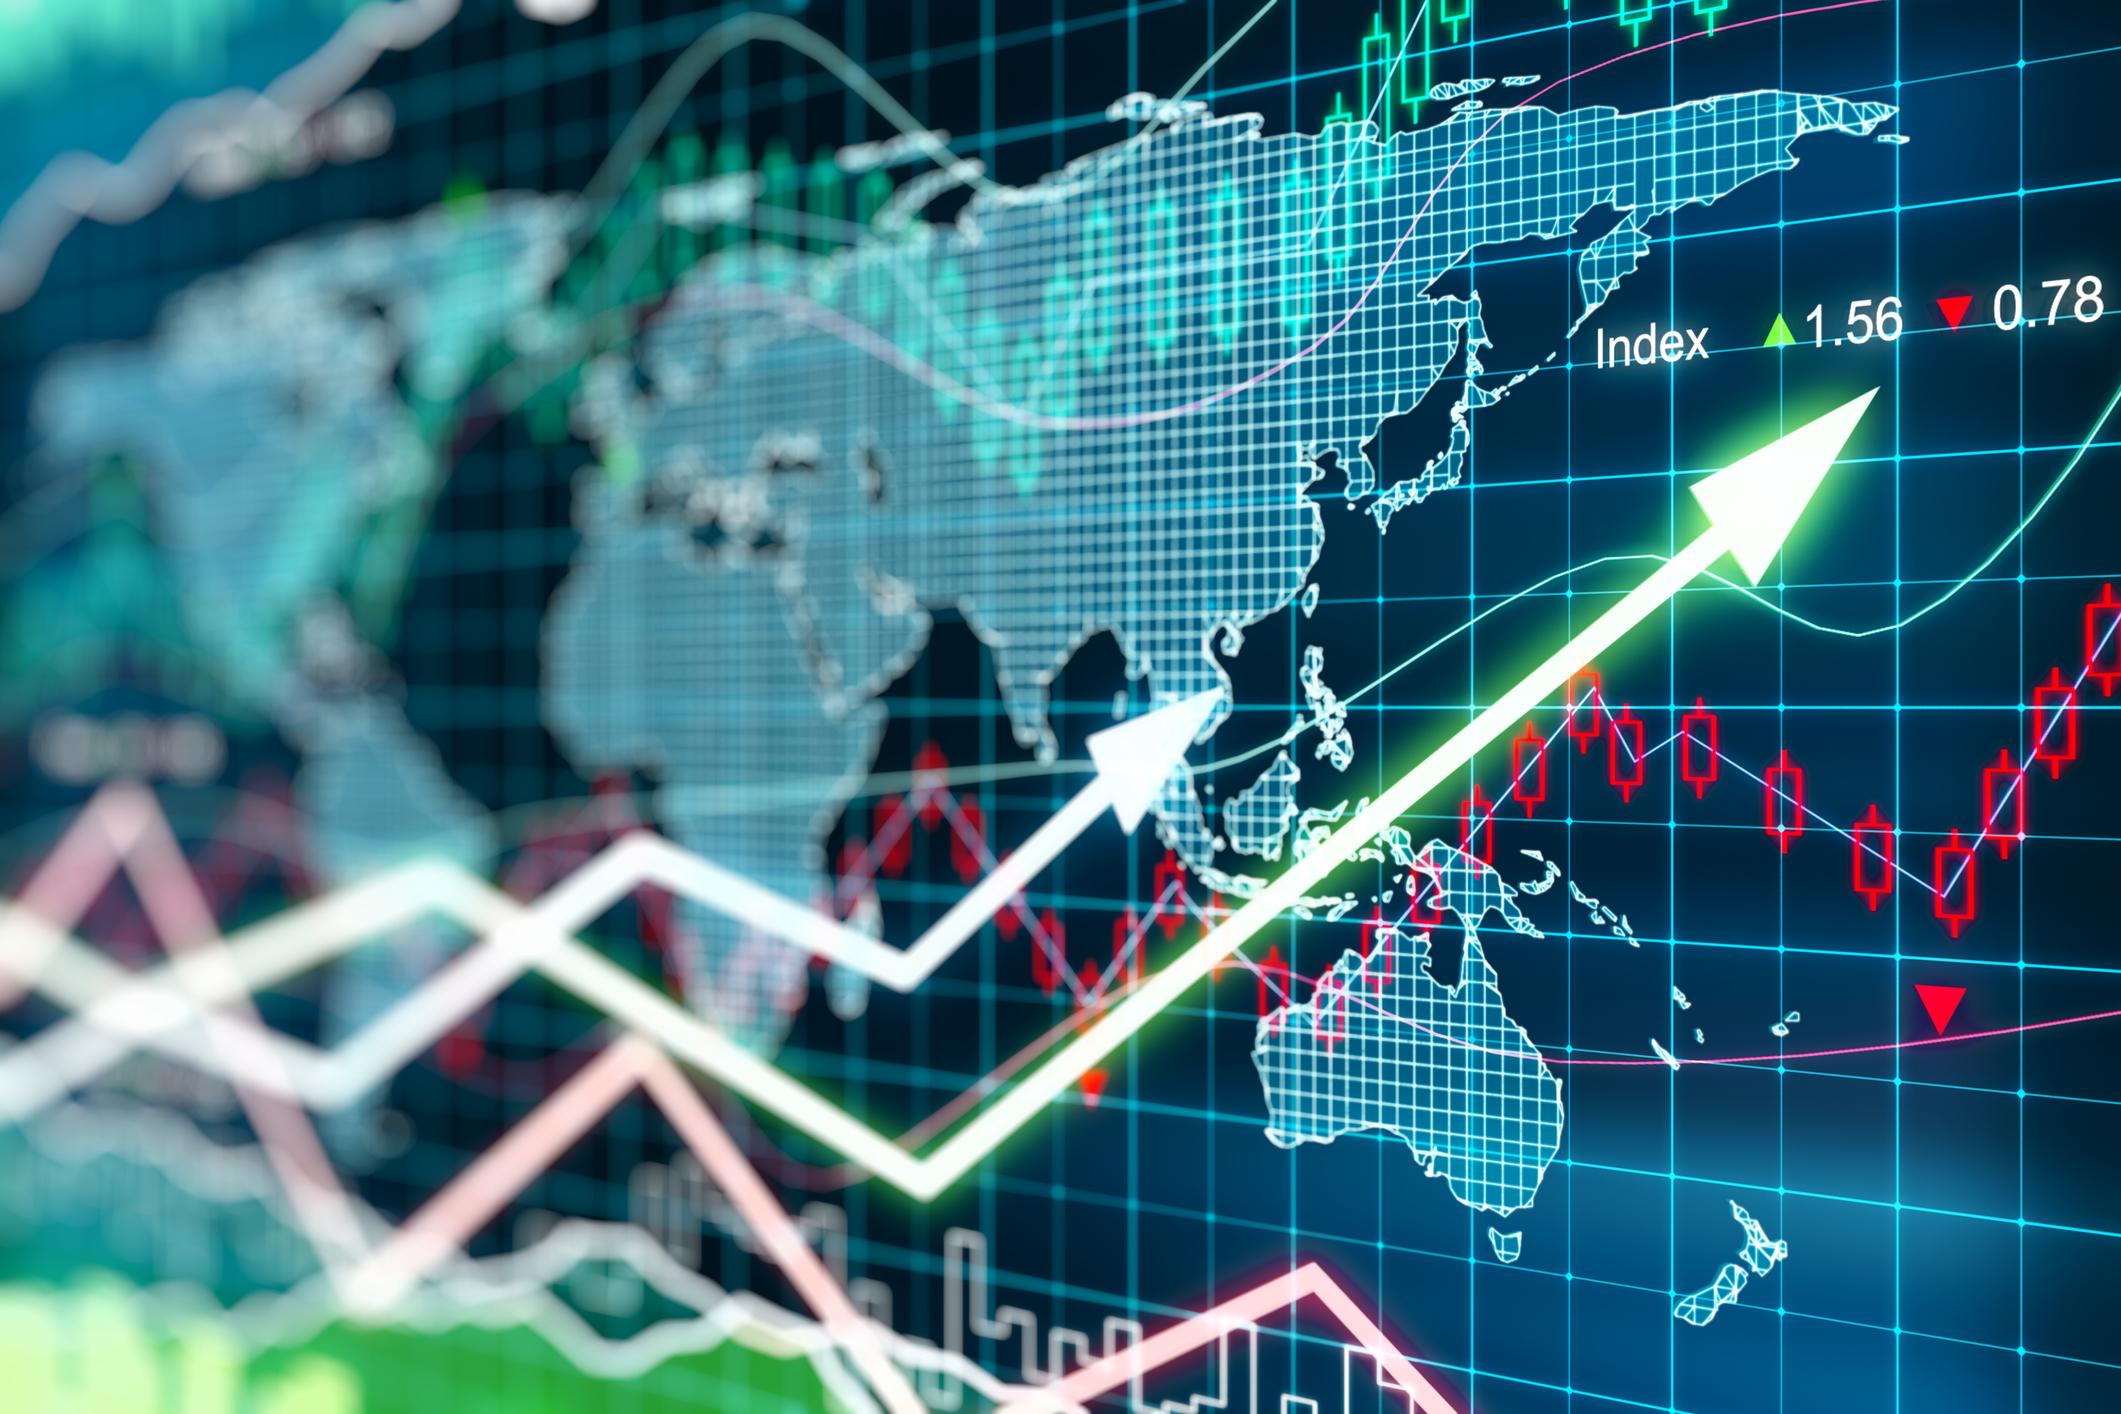 Rising stock chart